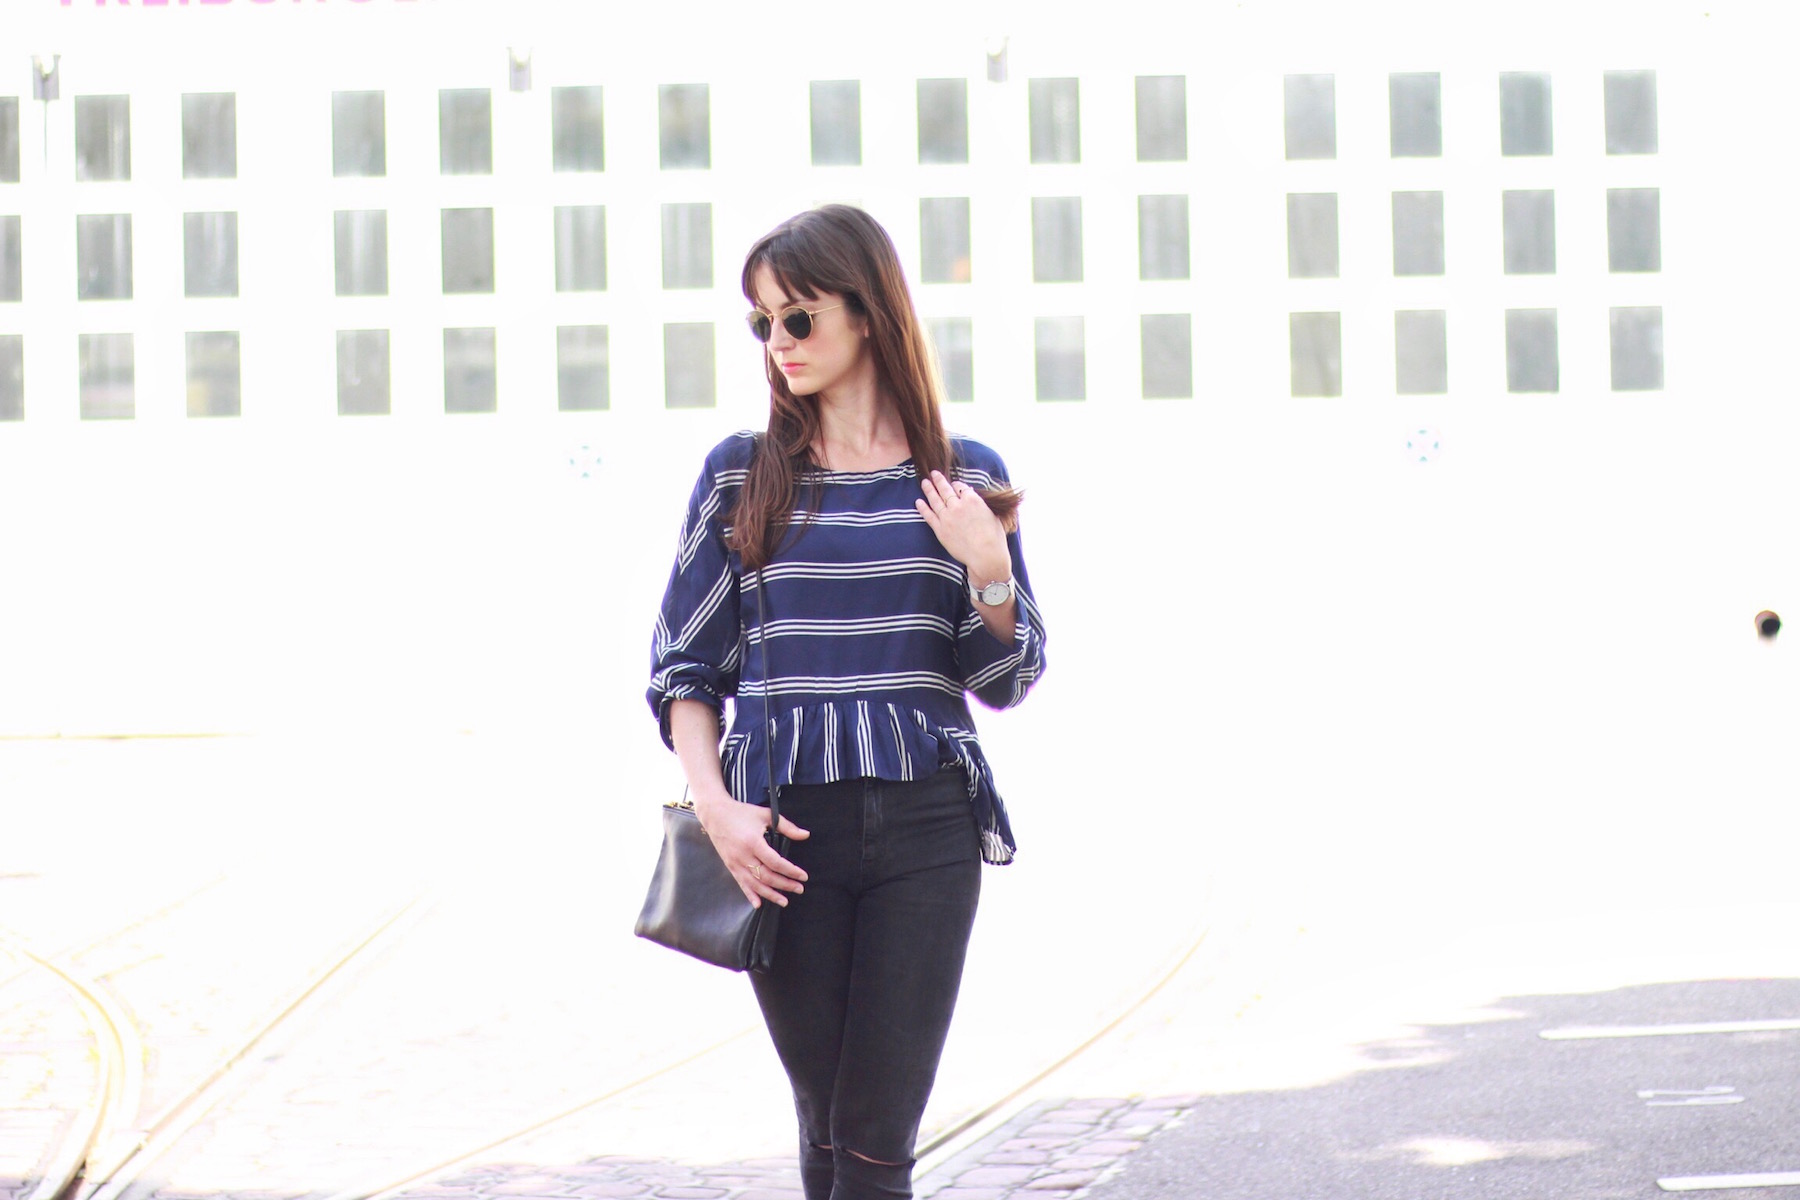 Chanel Look Alikes im Two Tone Stil Slingback Pumps der Modetrend auf allen Modeblags 2016